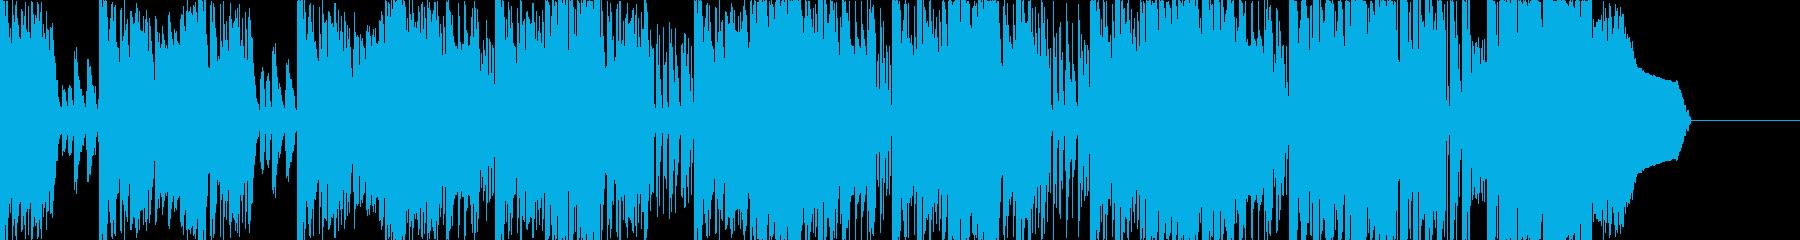 Early breakbeat jingle's reproduced waveform